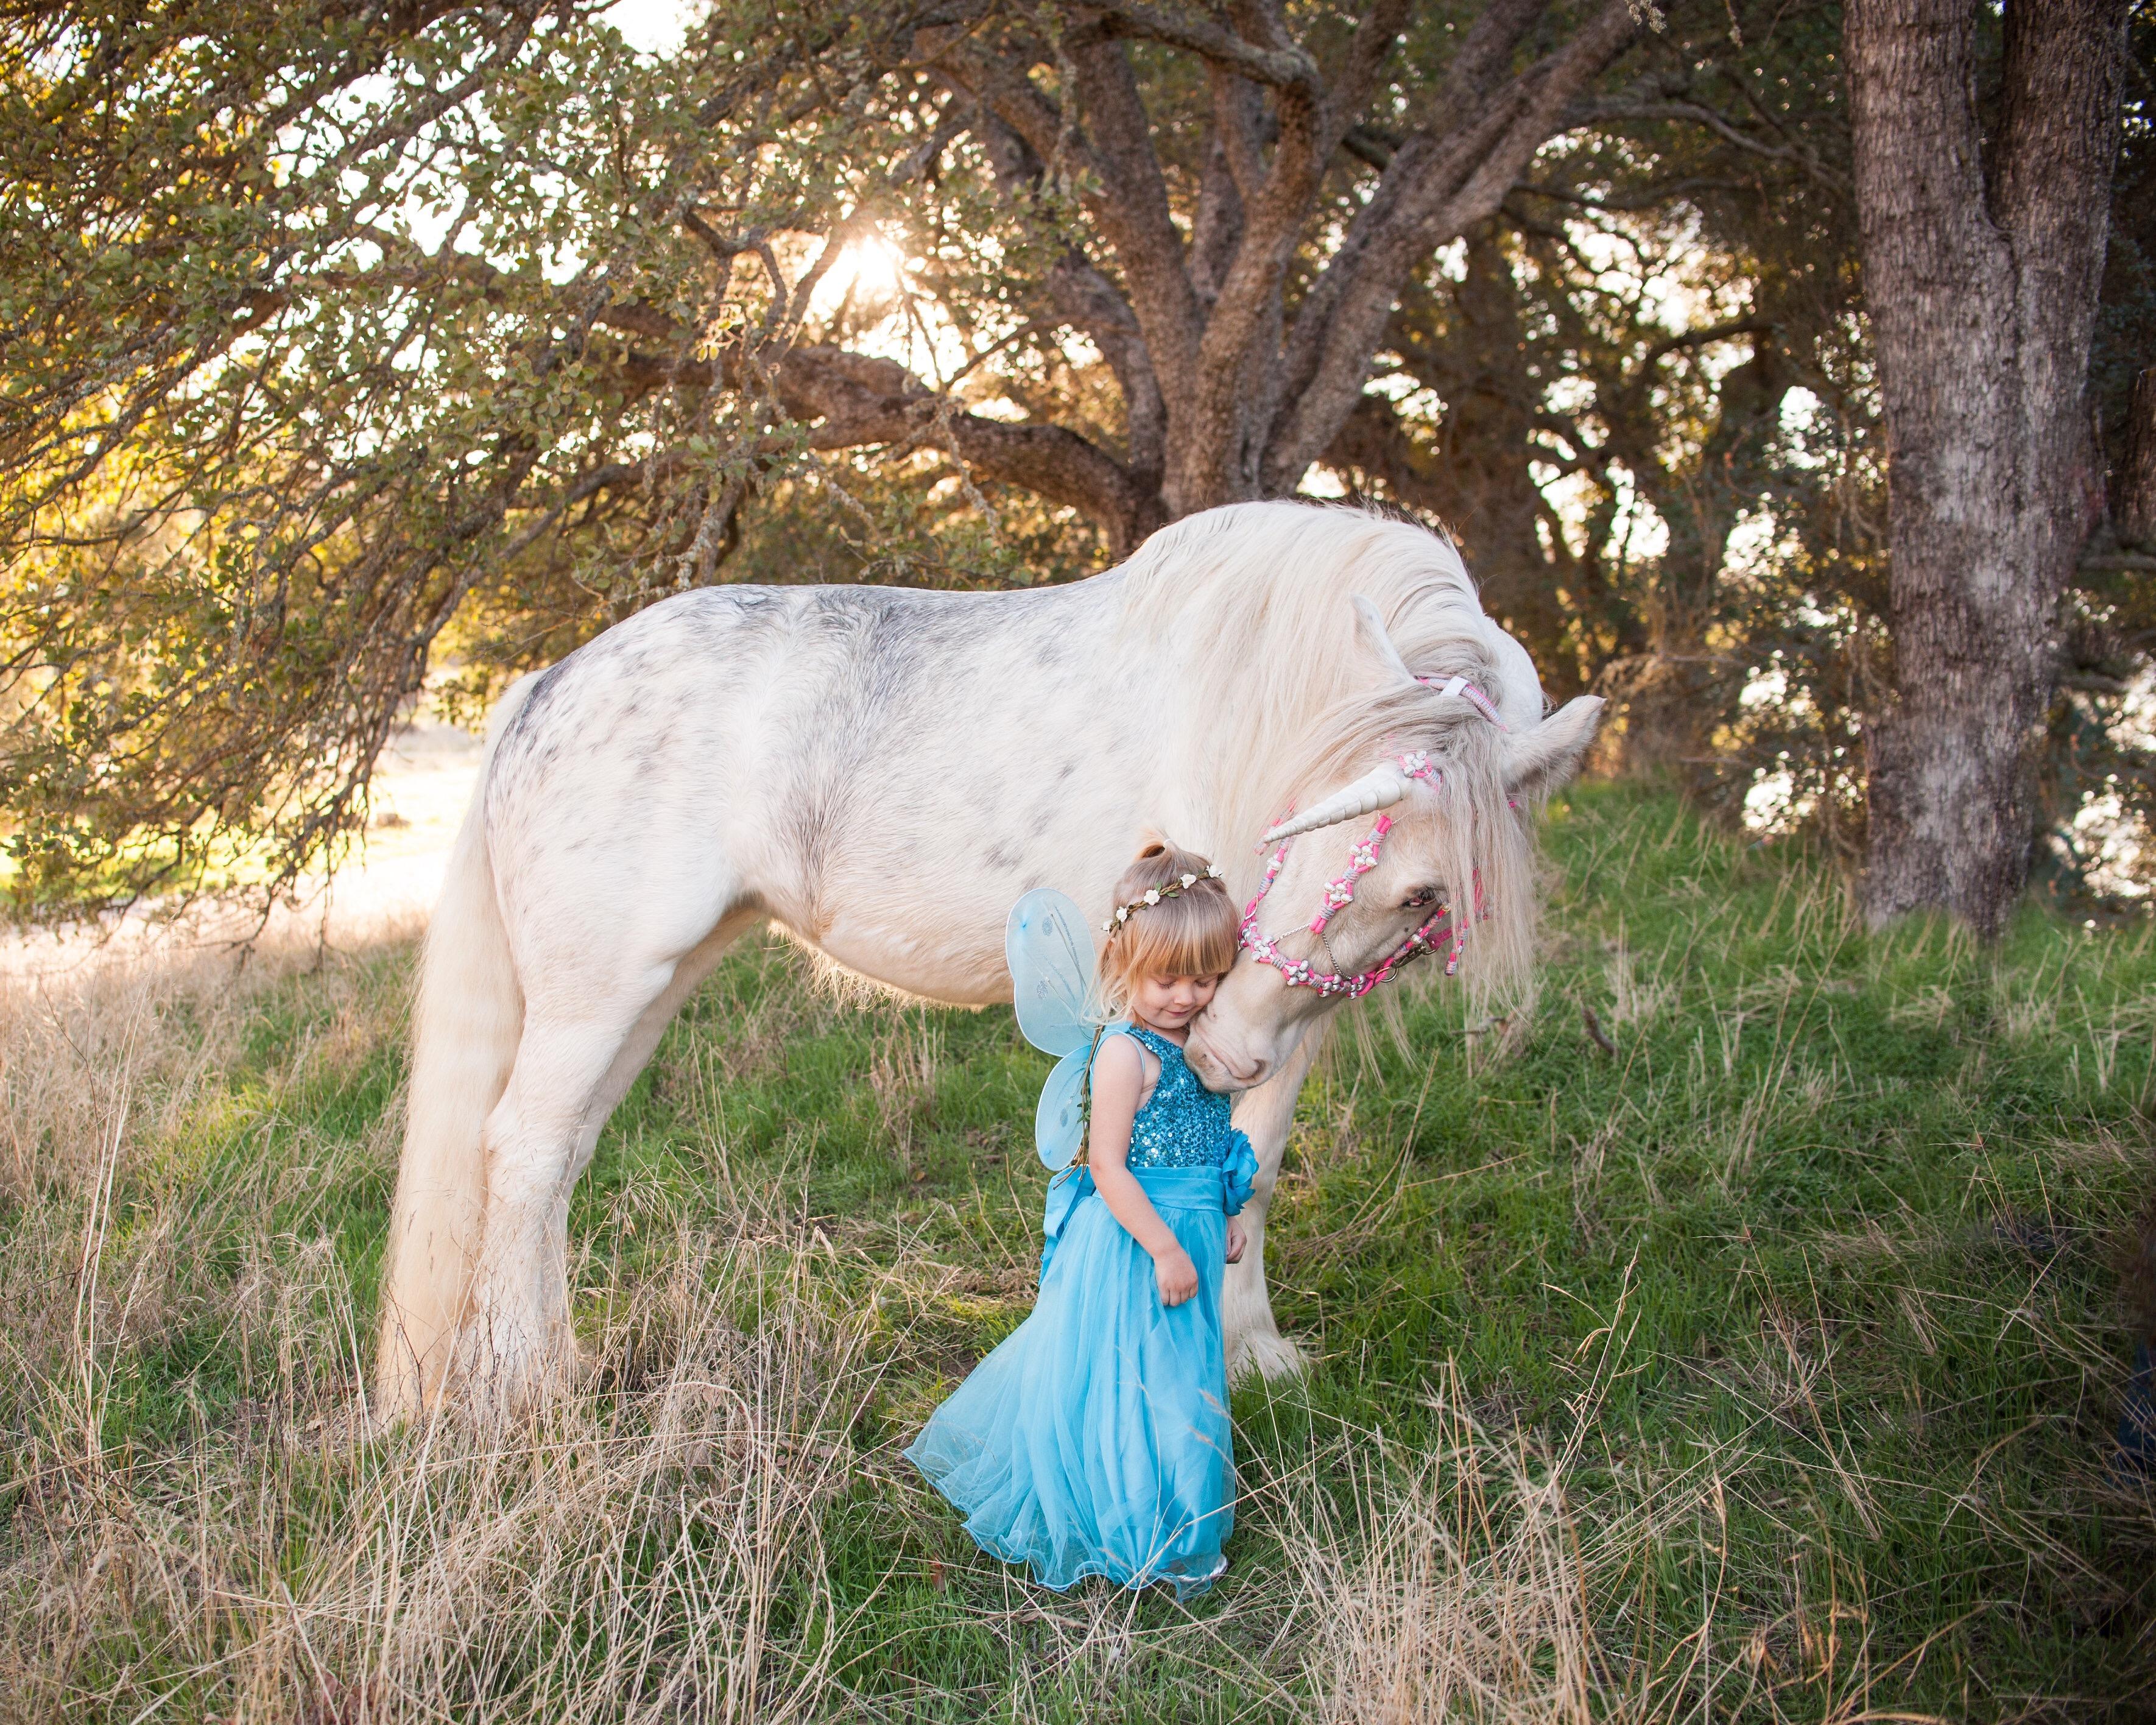 Magical unicorn nuzzles toddler dressed as a fairy princess in unicorn photoshoot in Creston, California. Unicorn hugs.